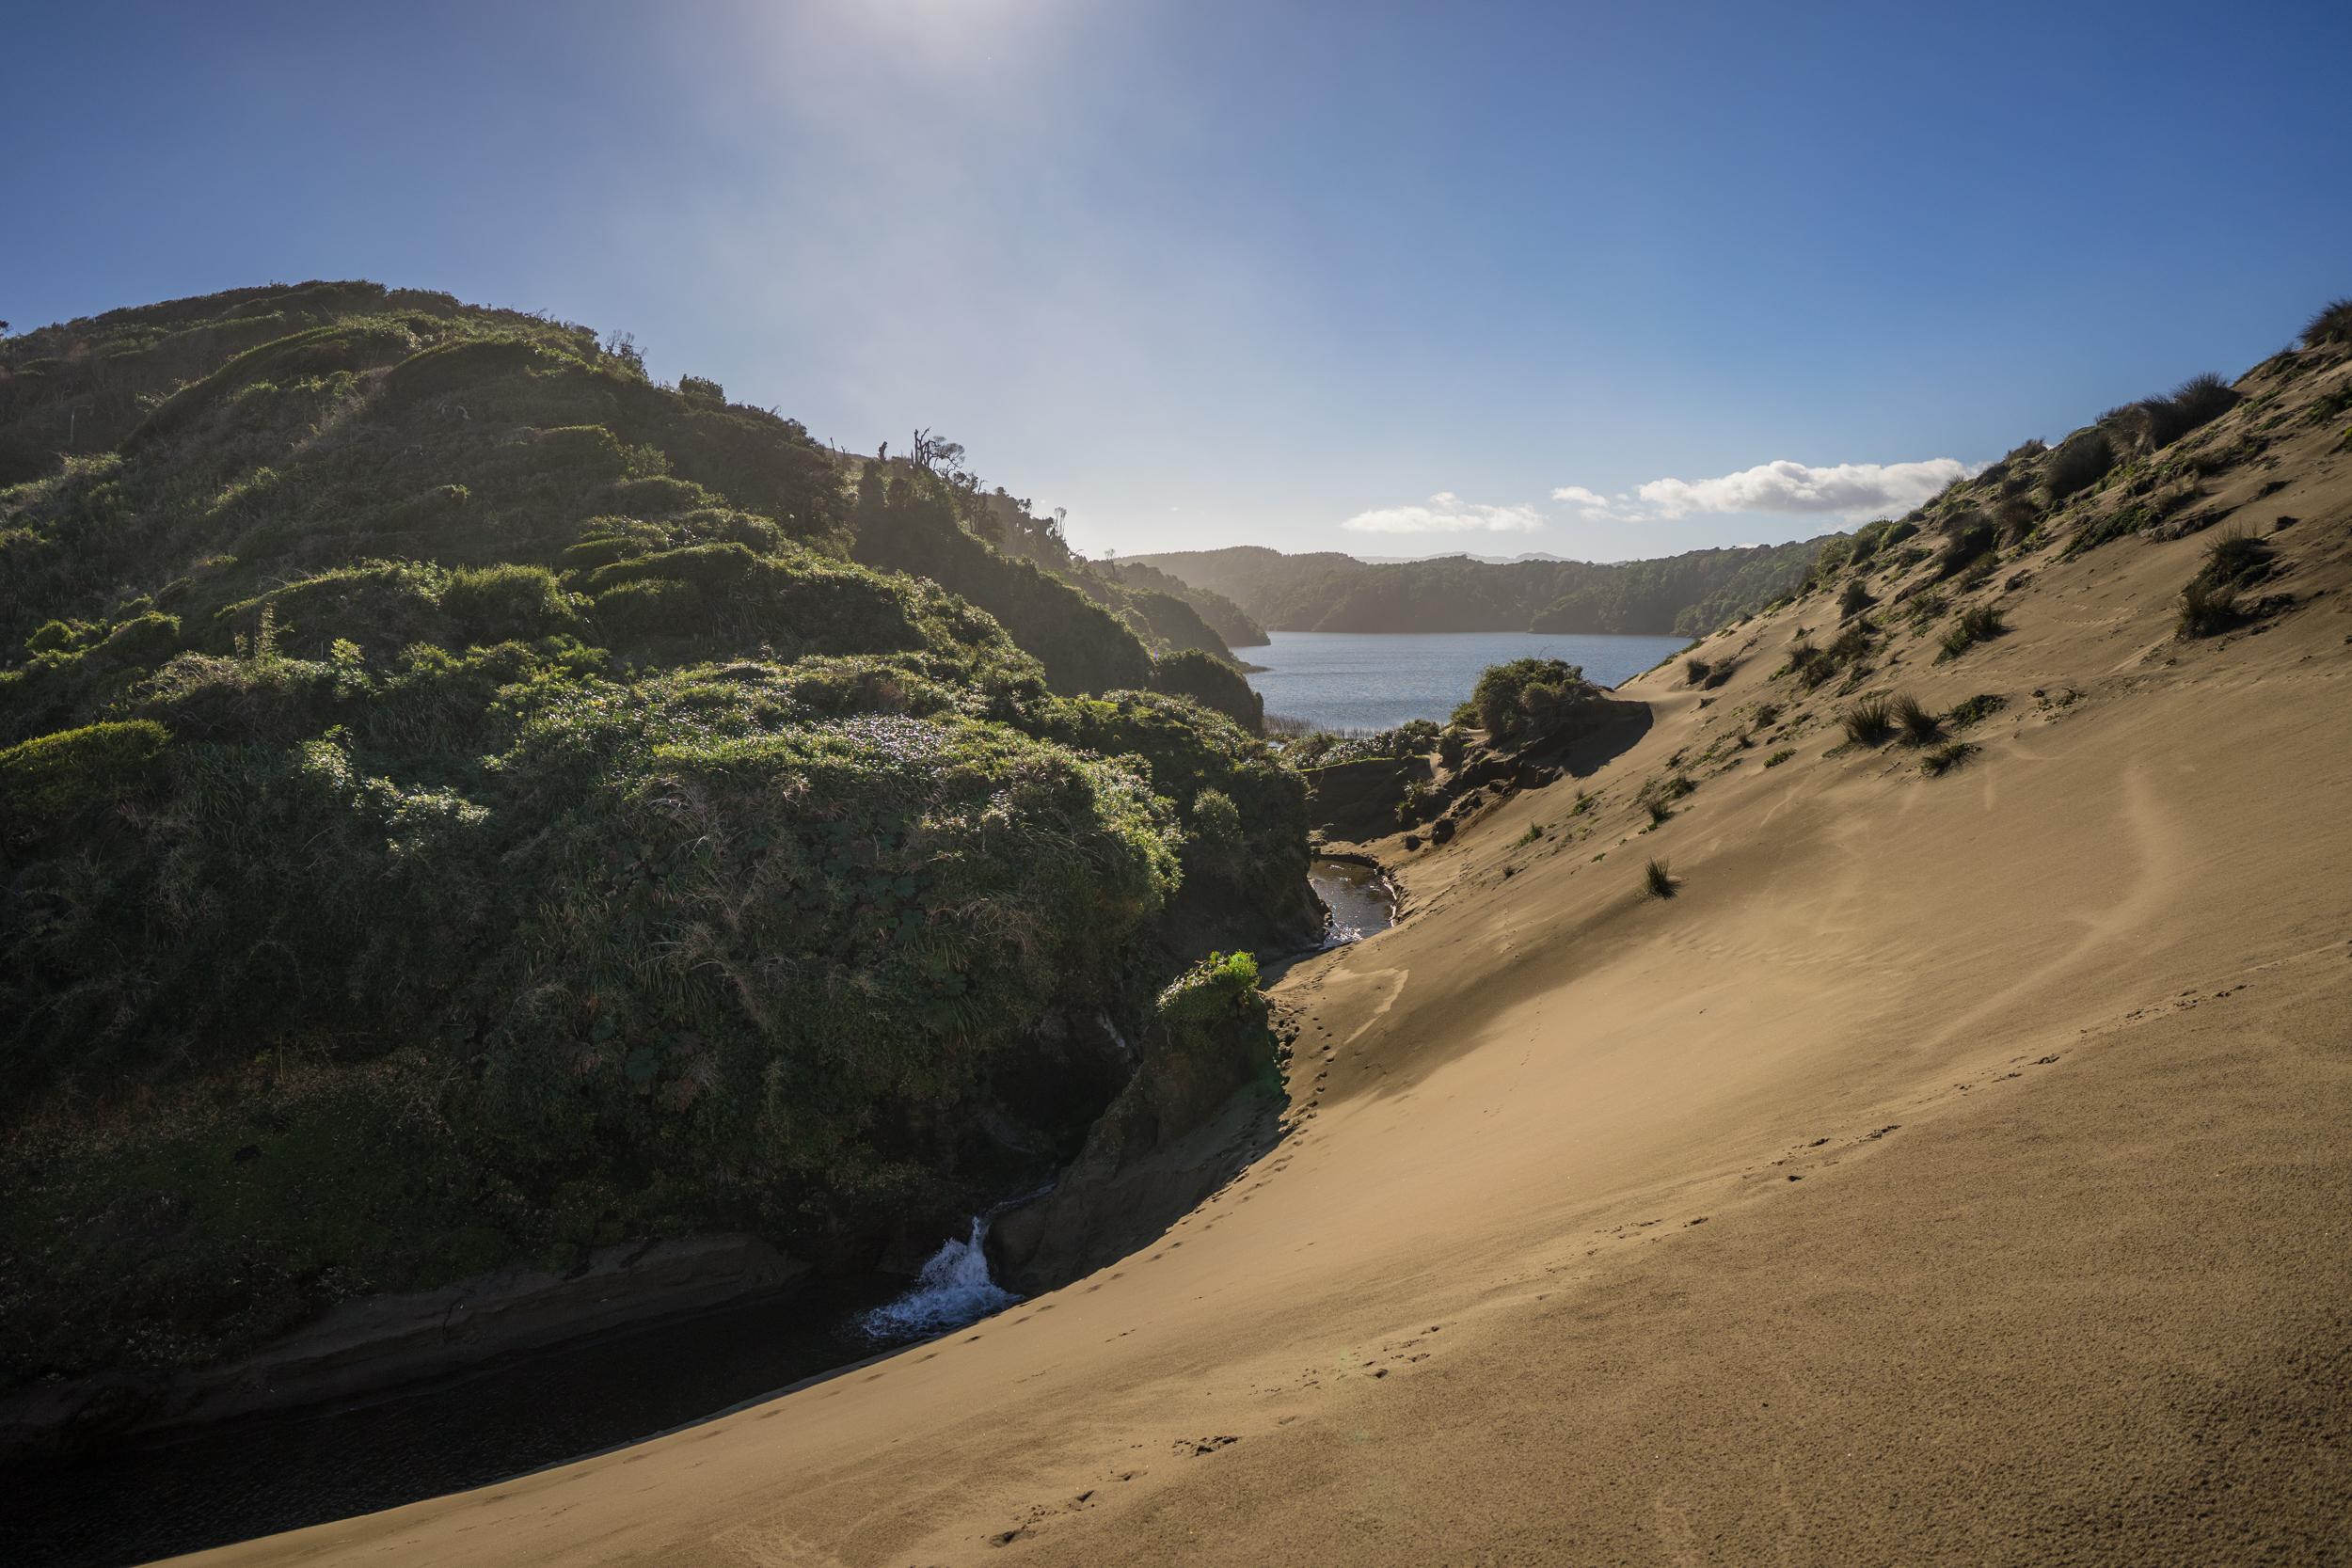 Valdivian Coastal Reserve dunes, Chile